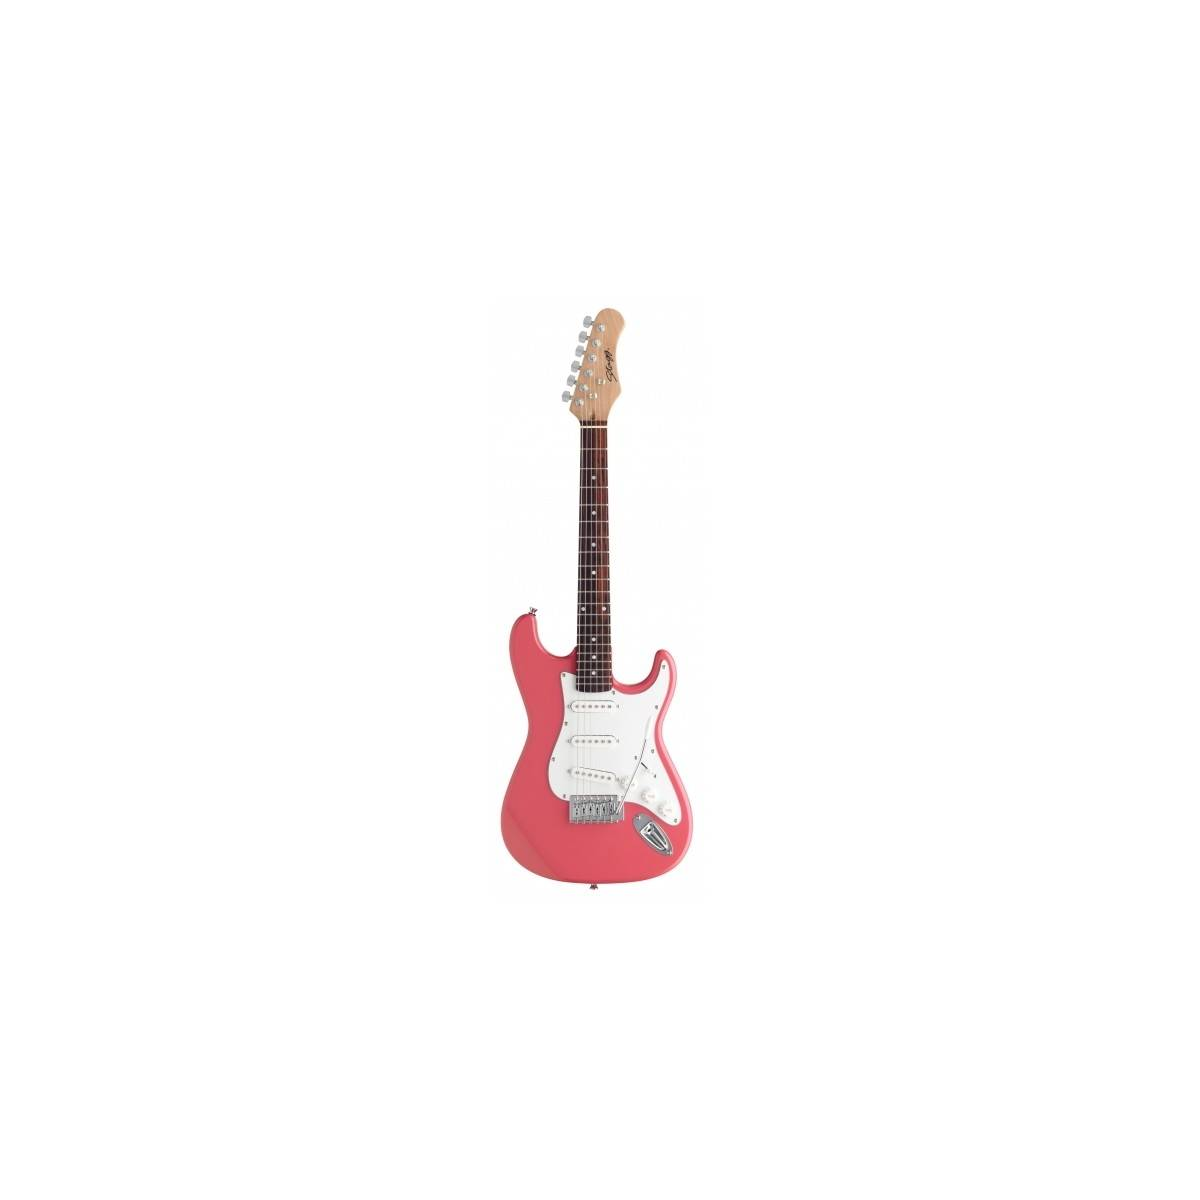 guitare lectrique enfant 3 4 rose stagg guitare lectrique enfant. Black Bedroom Furniture Sets. Home Design Ideas